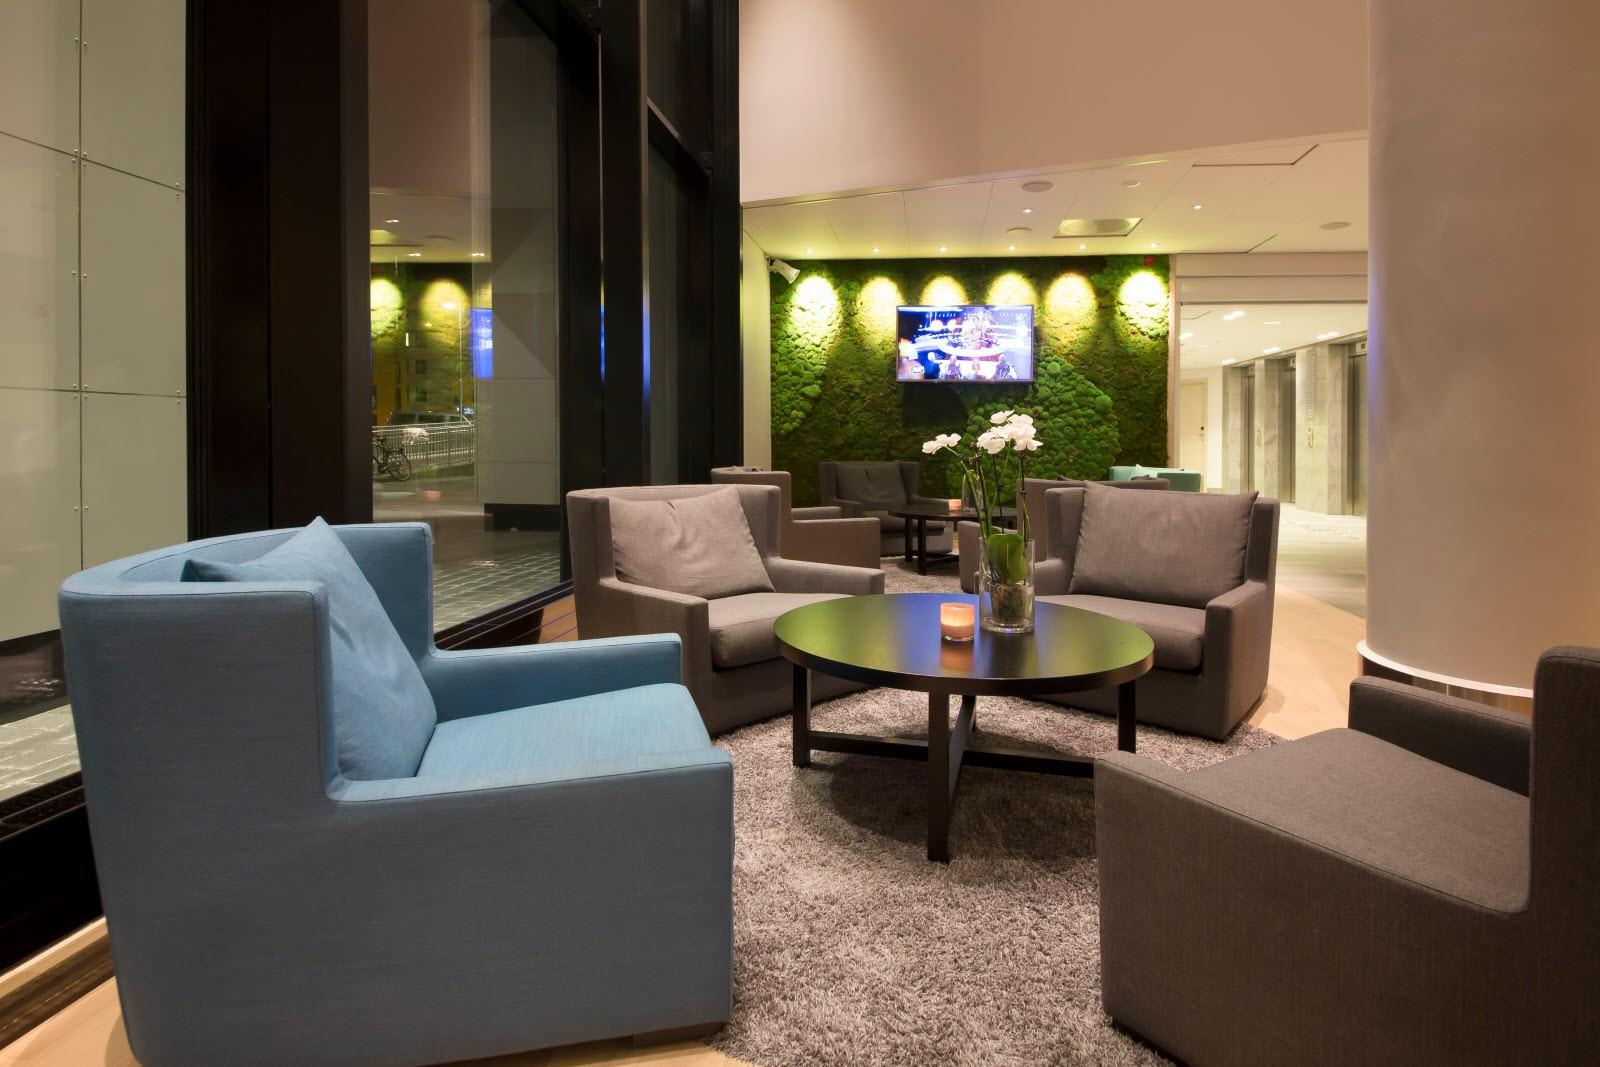 Hotel lobby furniture -  Exteriro Scandic Lerkendal Lobby Furniture